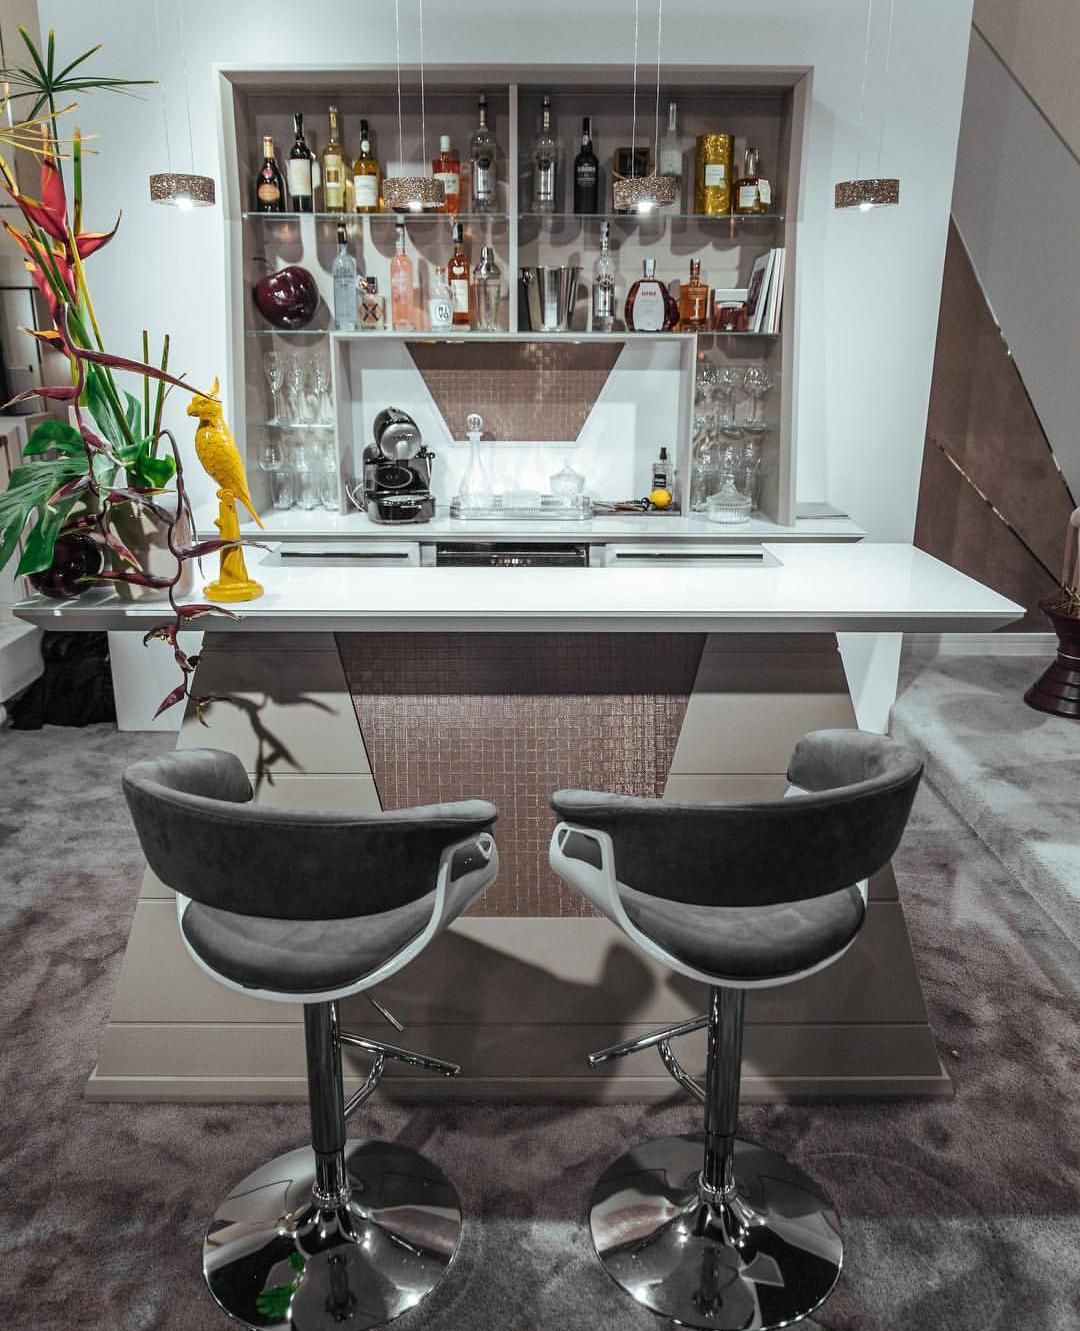 barfurnitureforsale u201d bar furniture pinterest bar furniture rh pinterest com